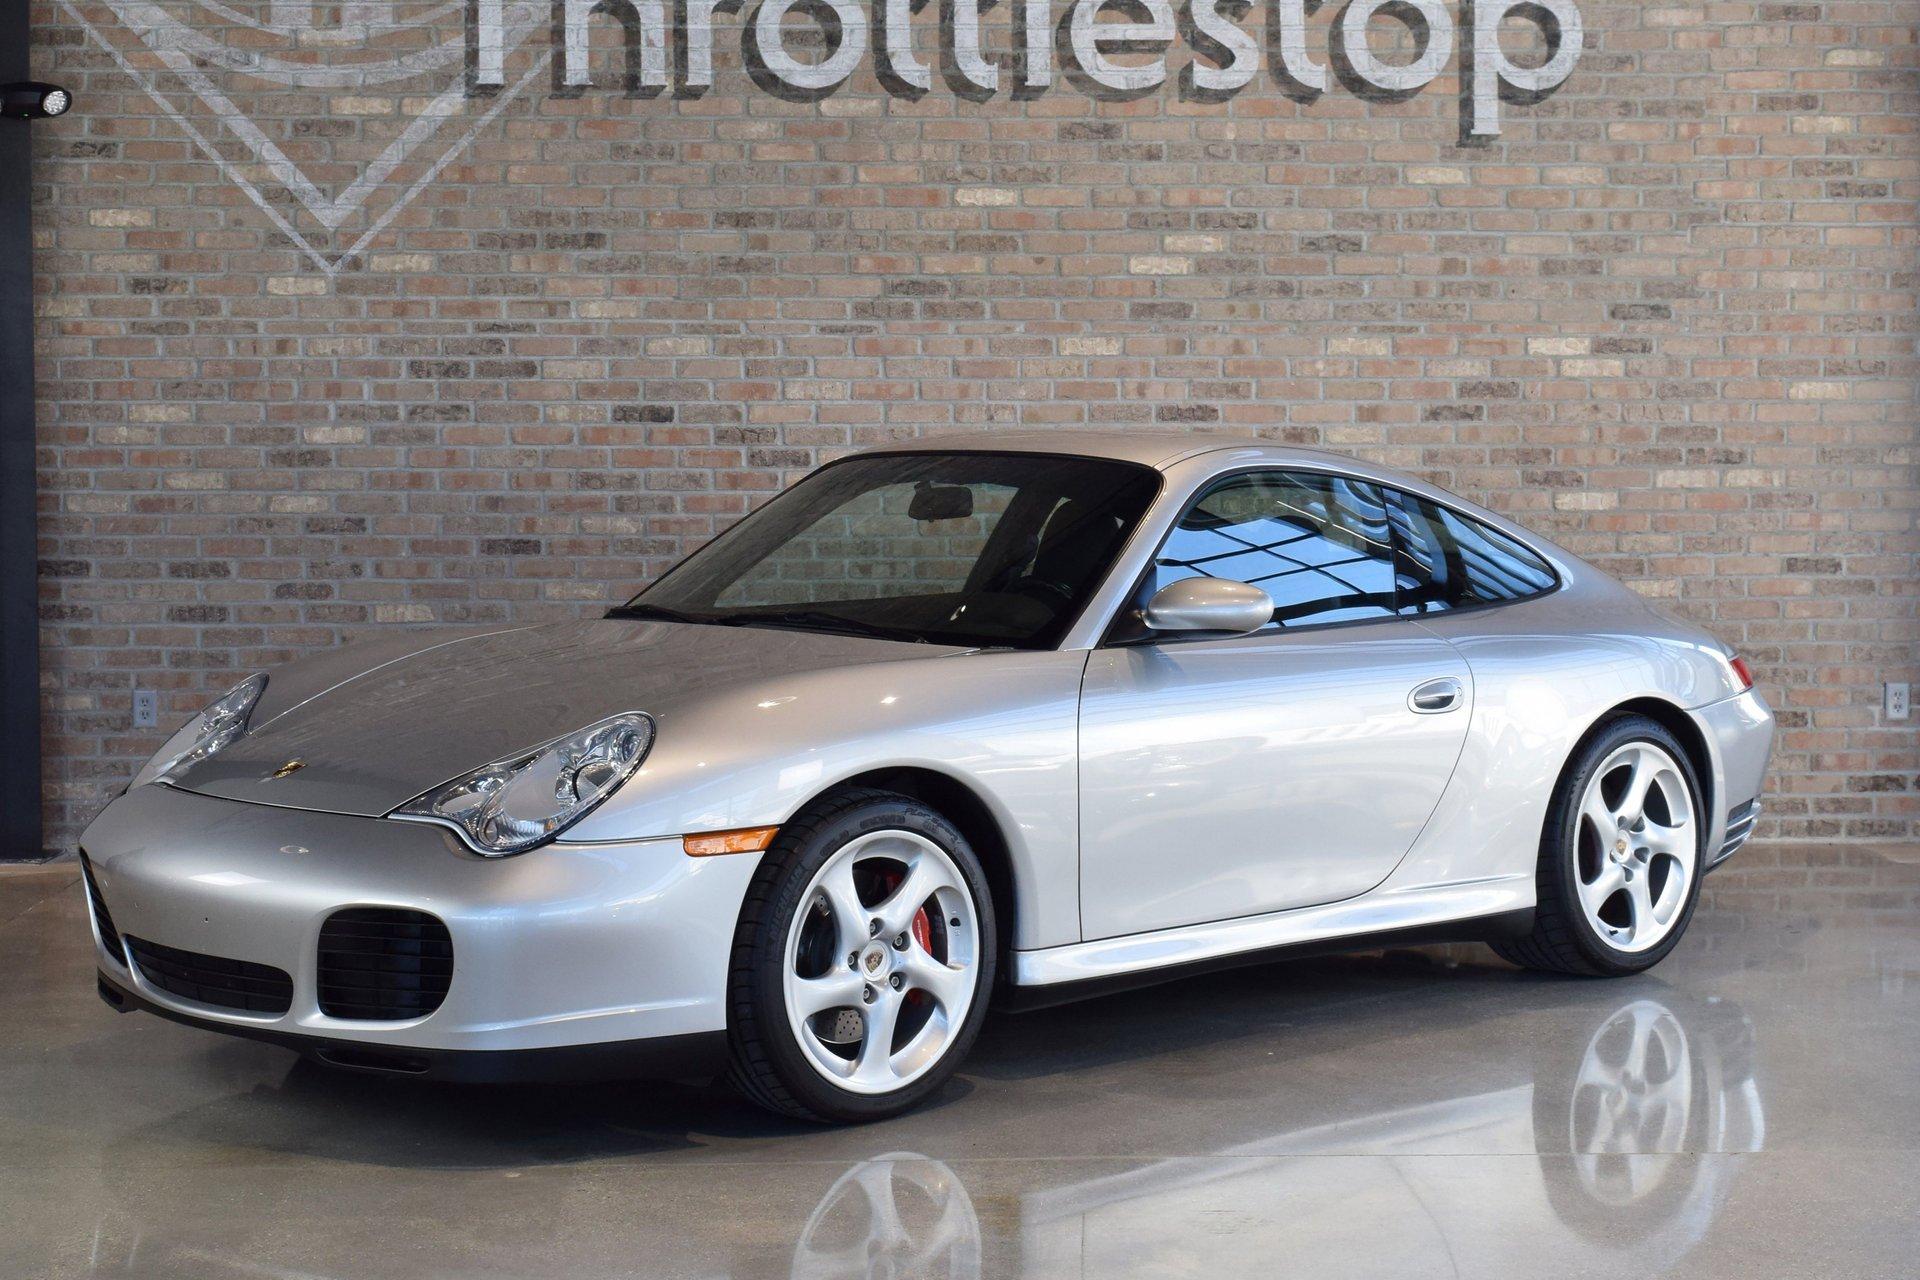 2002 porsche 911 c4s coupe